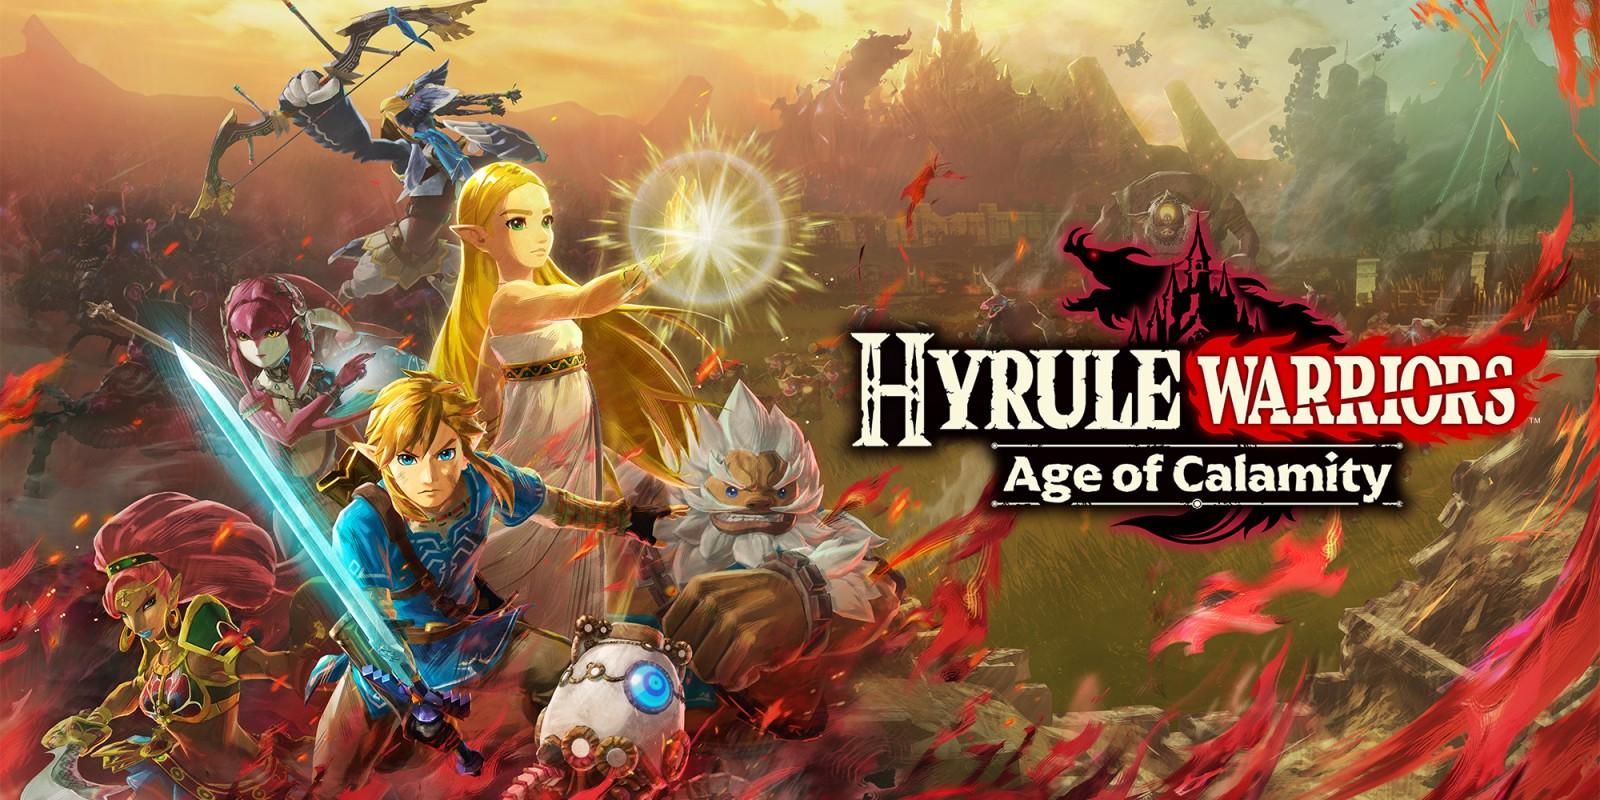 Hyrule Warriors: L'era della calamità locandina